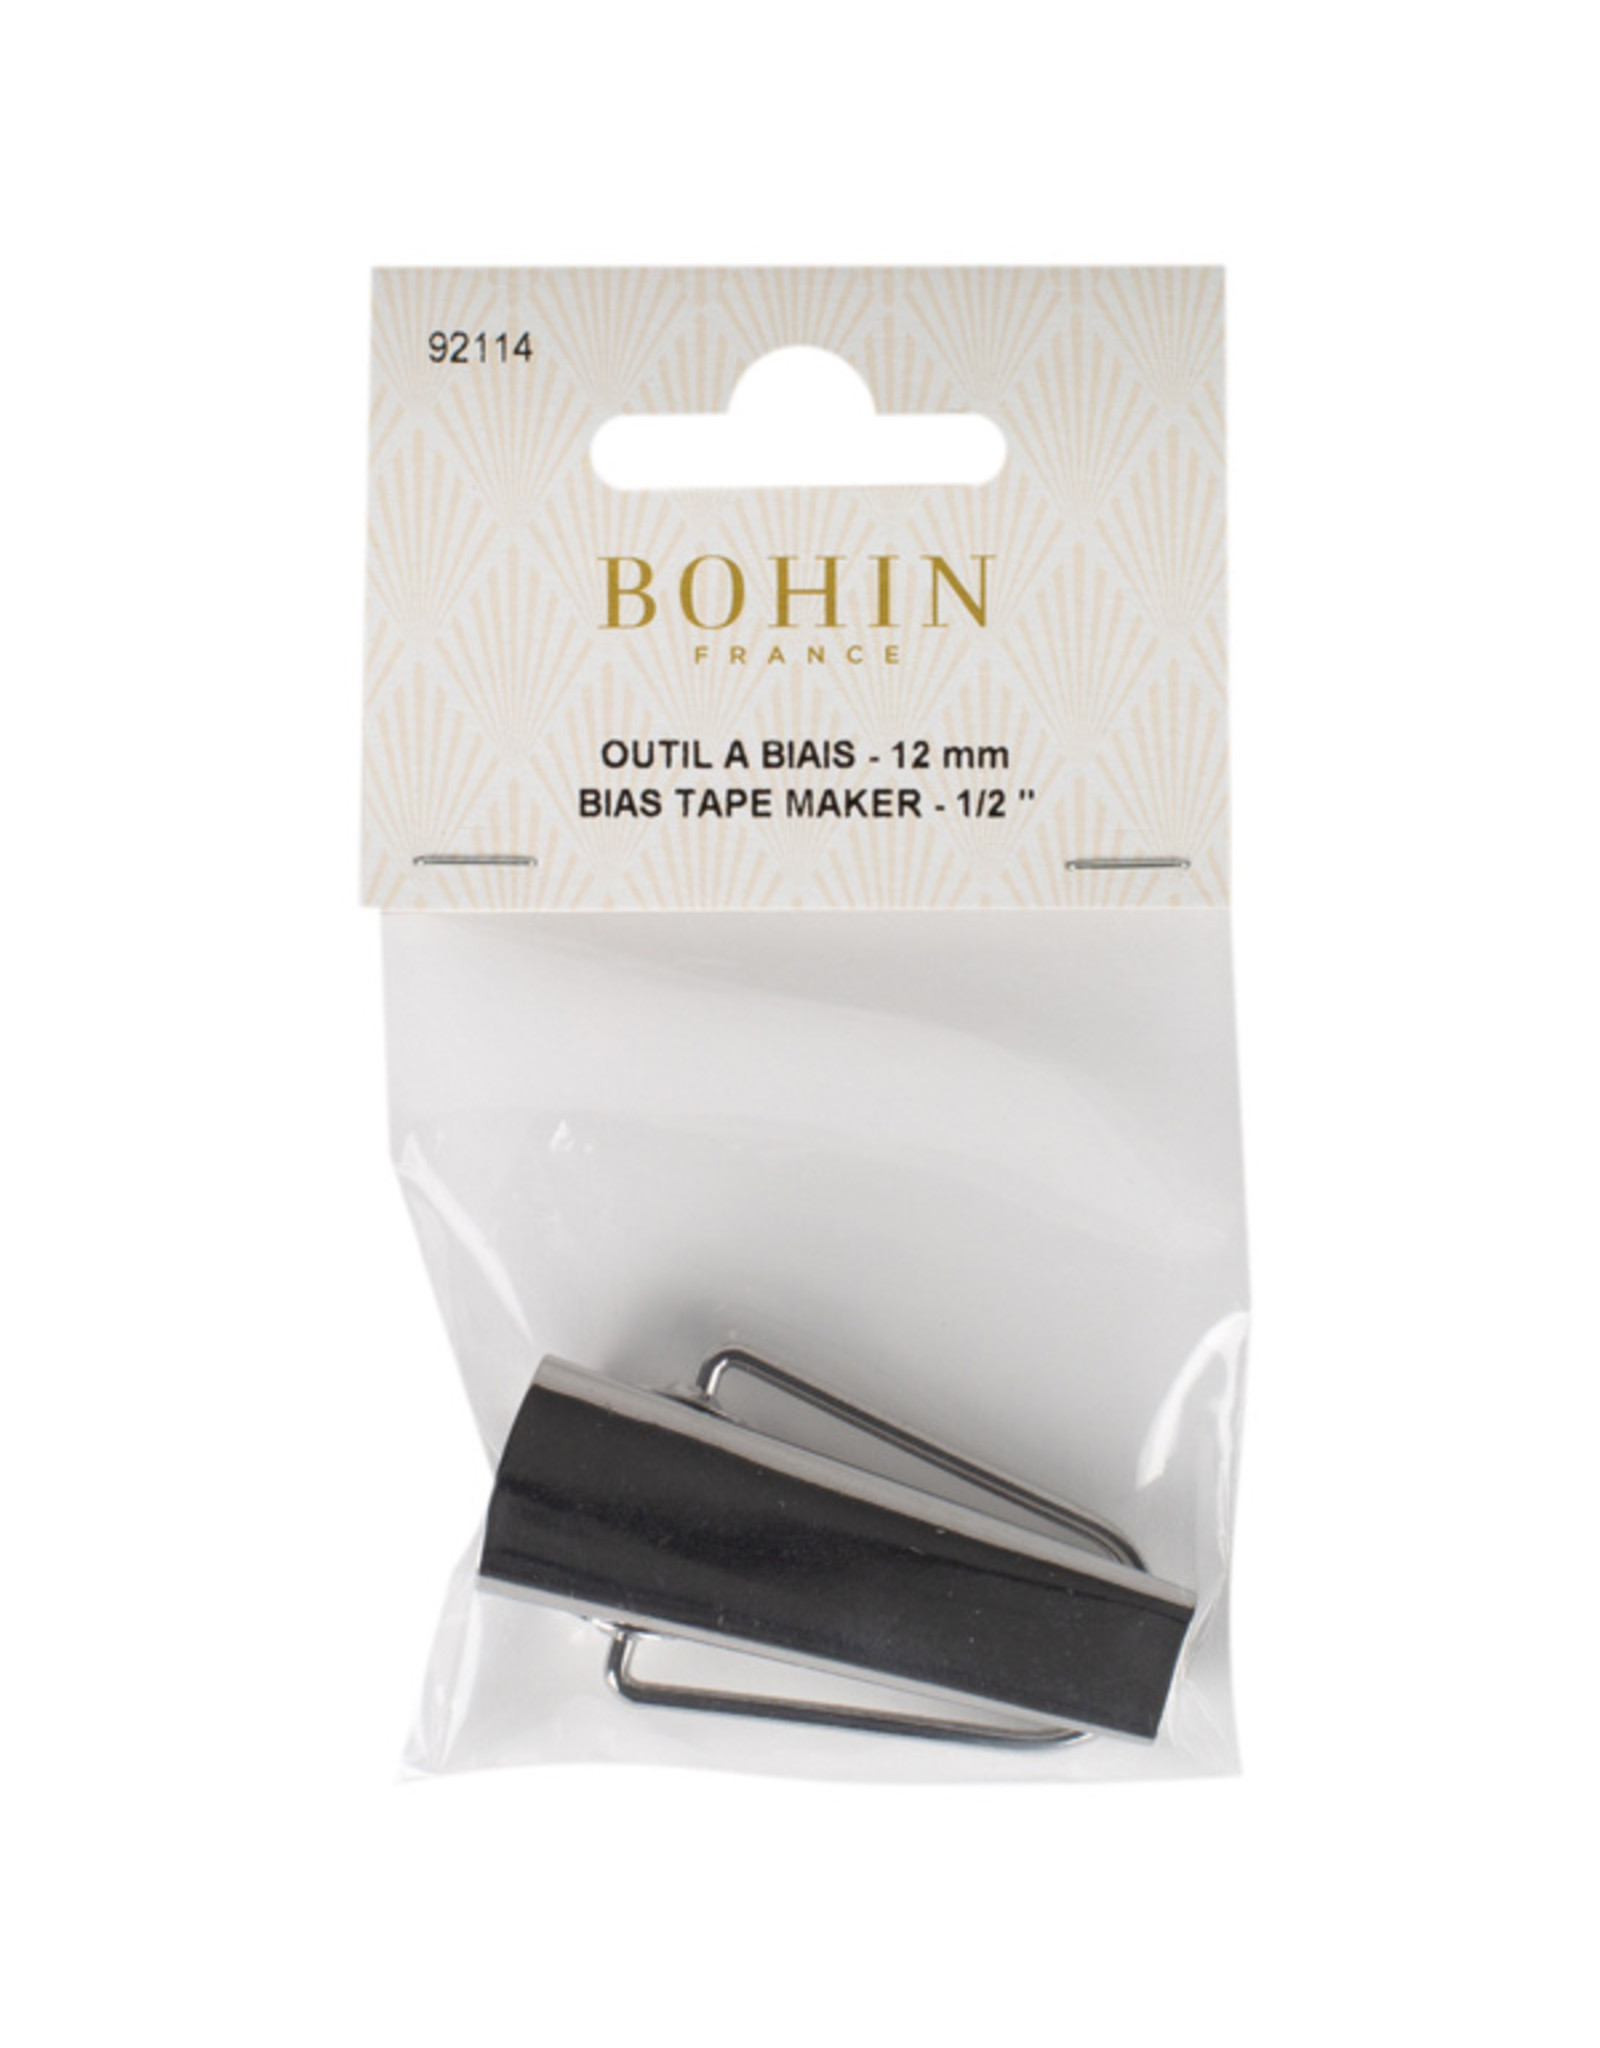 Bohin Bias Tape Maker 12 mm